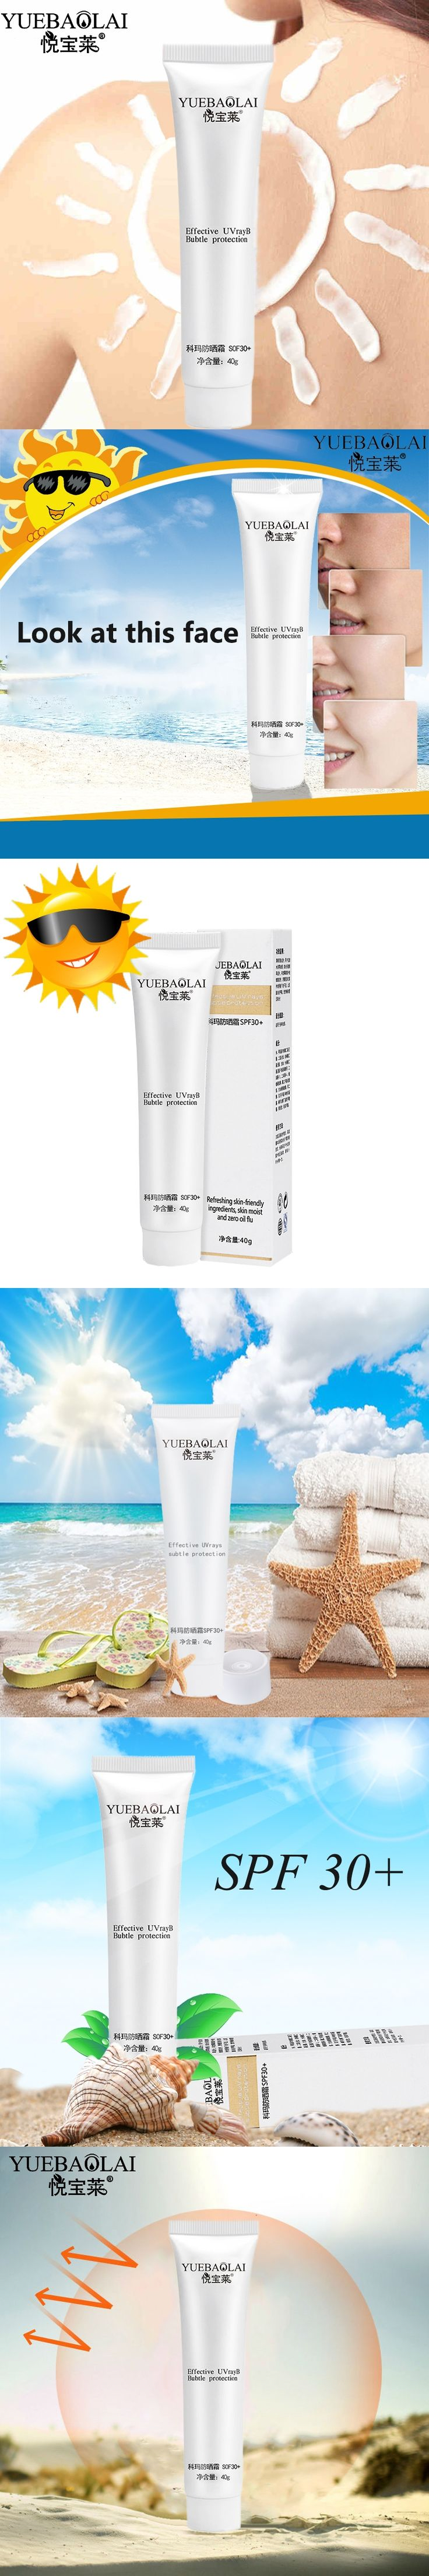 Face Skin Care Whitening Sun Protection Sunscreen Cream Waterproof Moisturizing Sunblock Cream Spf 30+ For Man And Woman